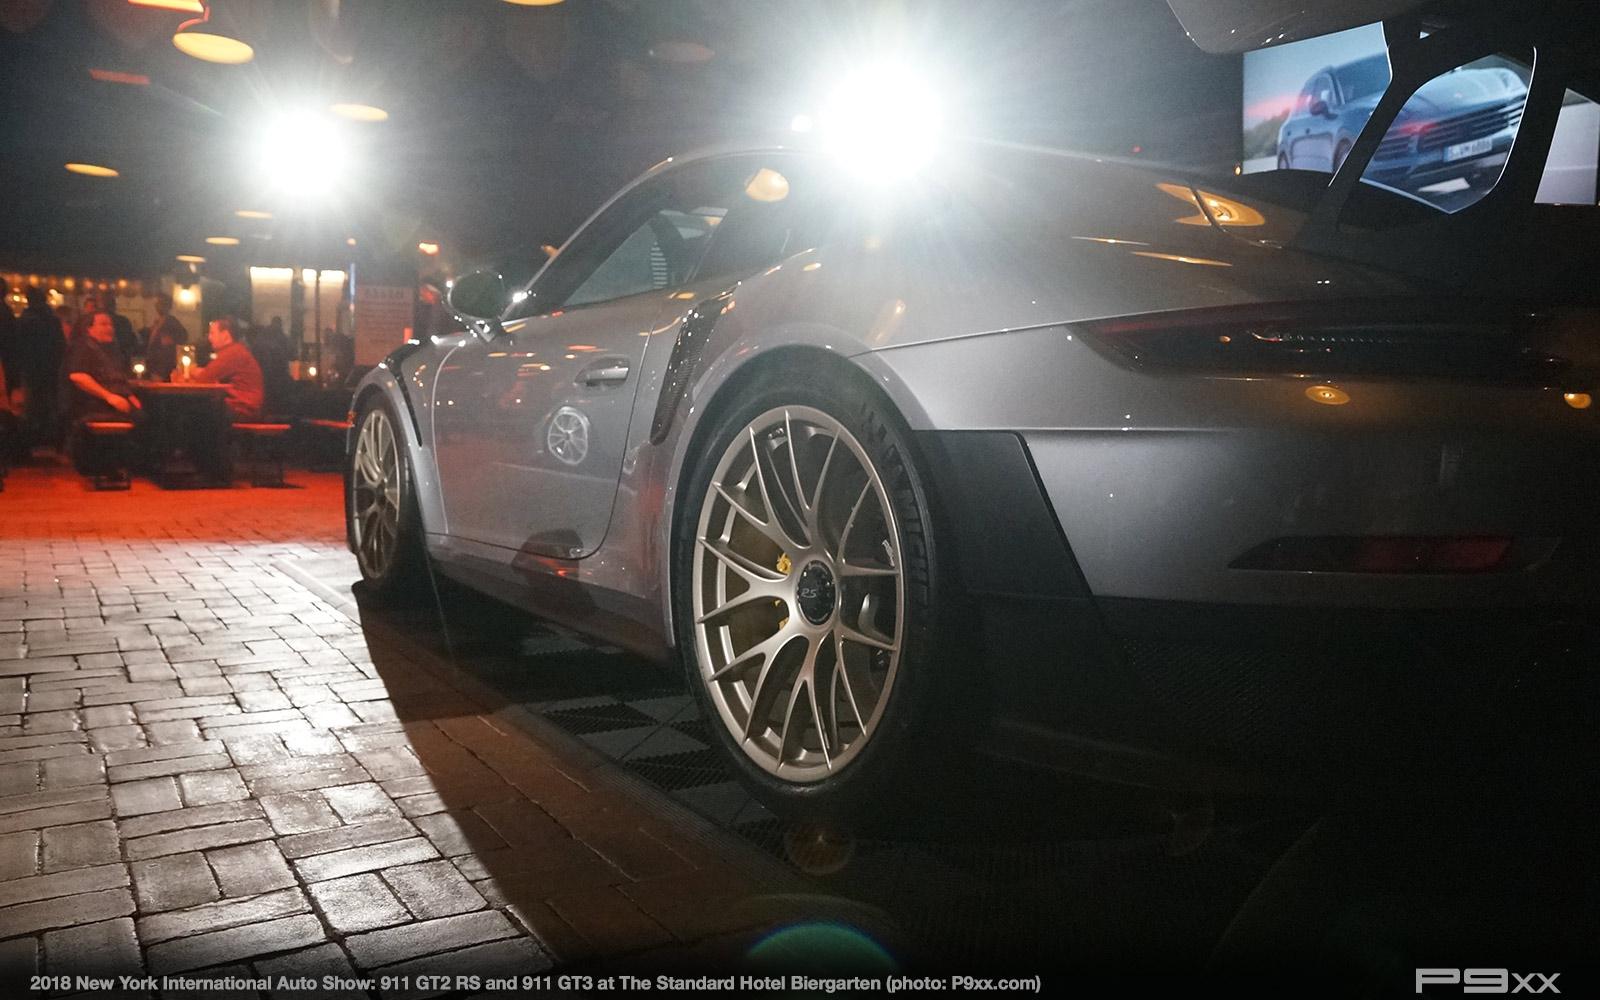 2018-ny-auto-show-porsche-305